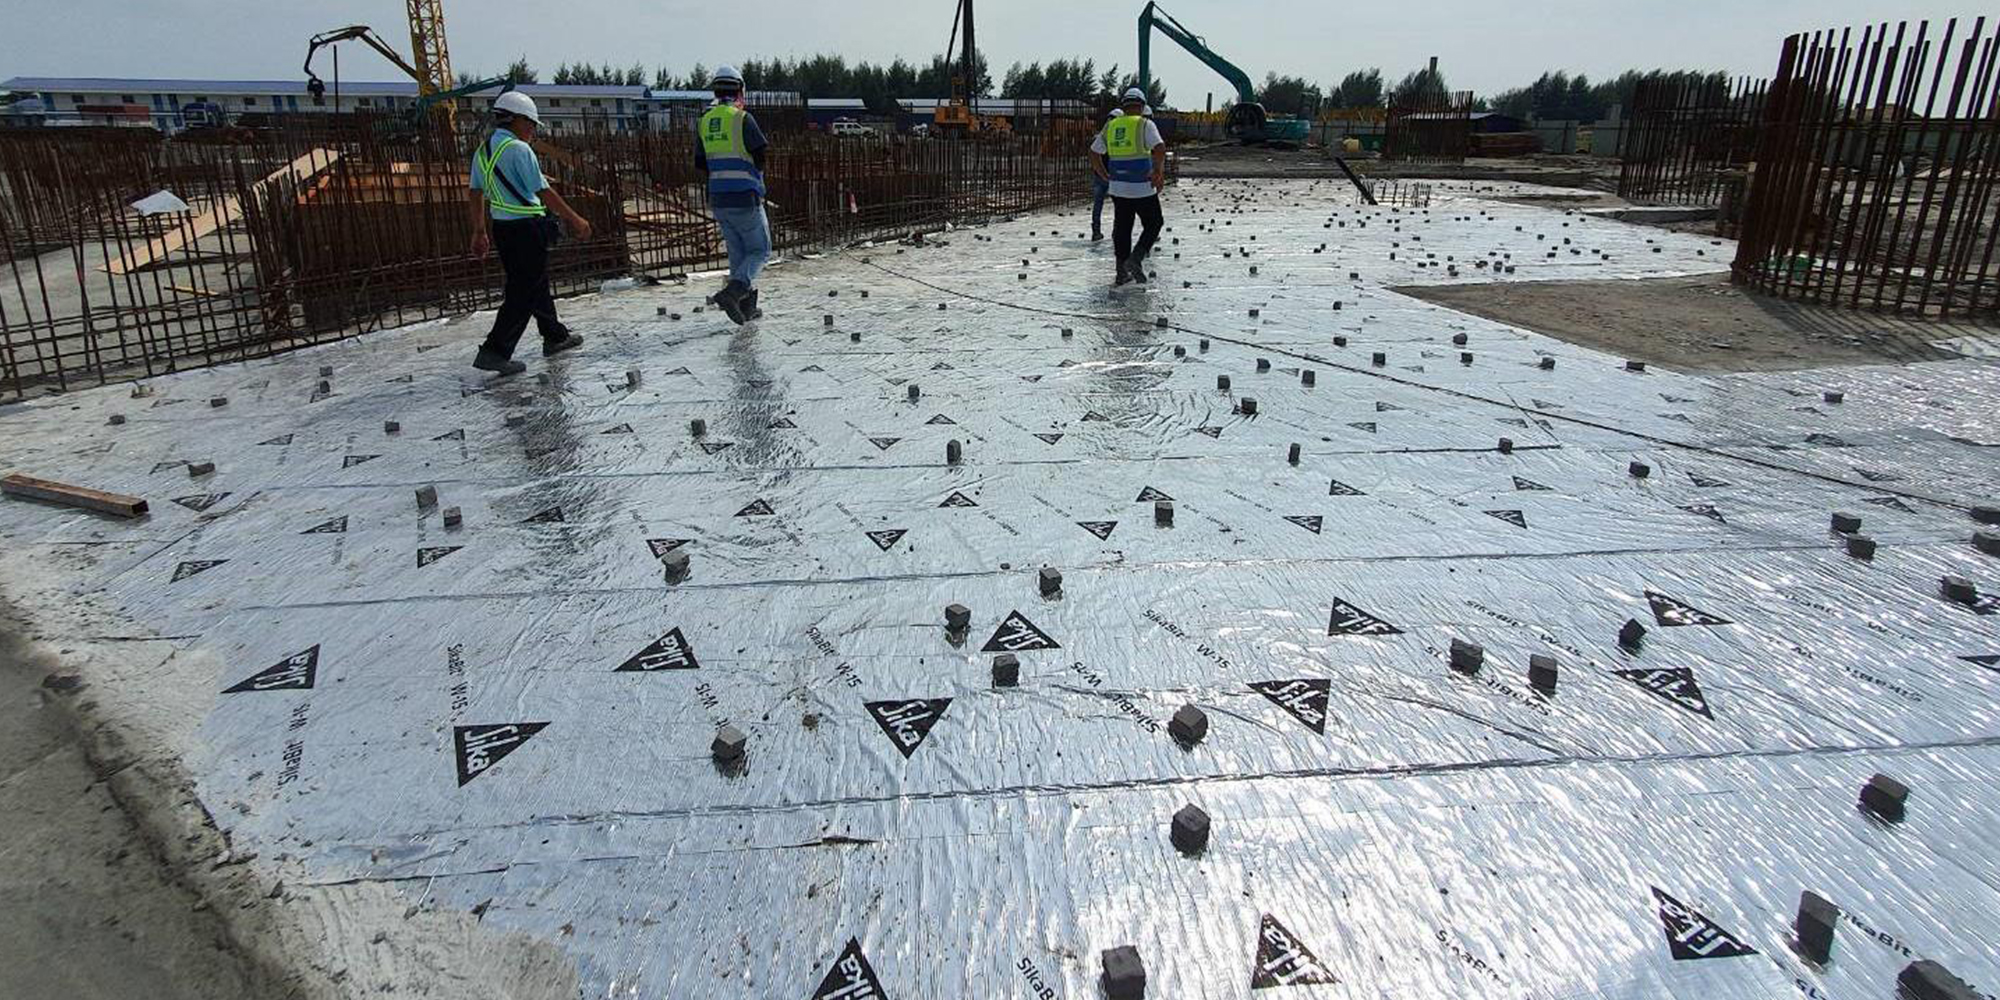 06-B 棟區域 防潮膜施工完成預備鋼筋綁紥